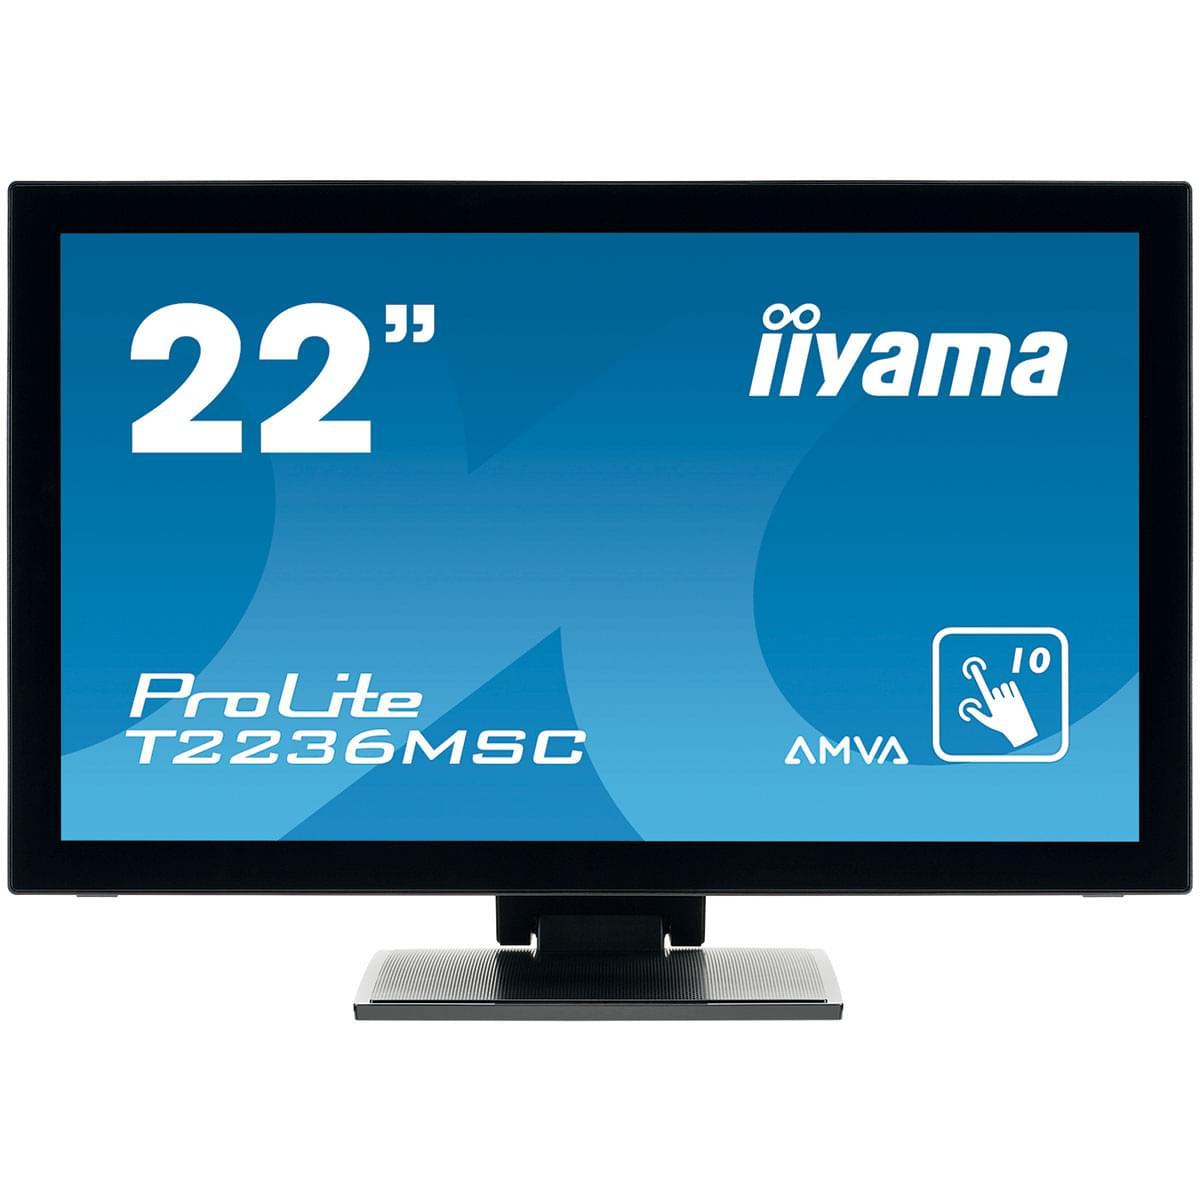 Iiyama T2236MSC-B1 (T2236MSC-B1) - Achat / Vente Ecran PC sur Cybertek.fr - 0